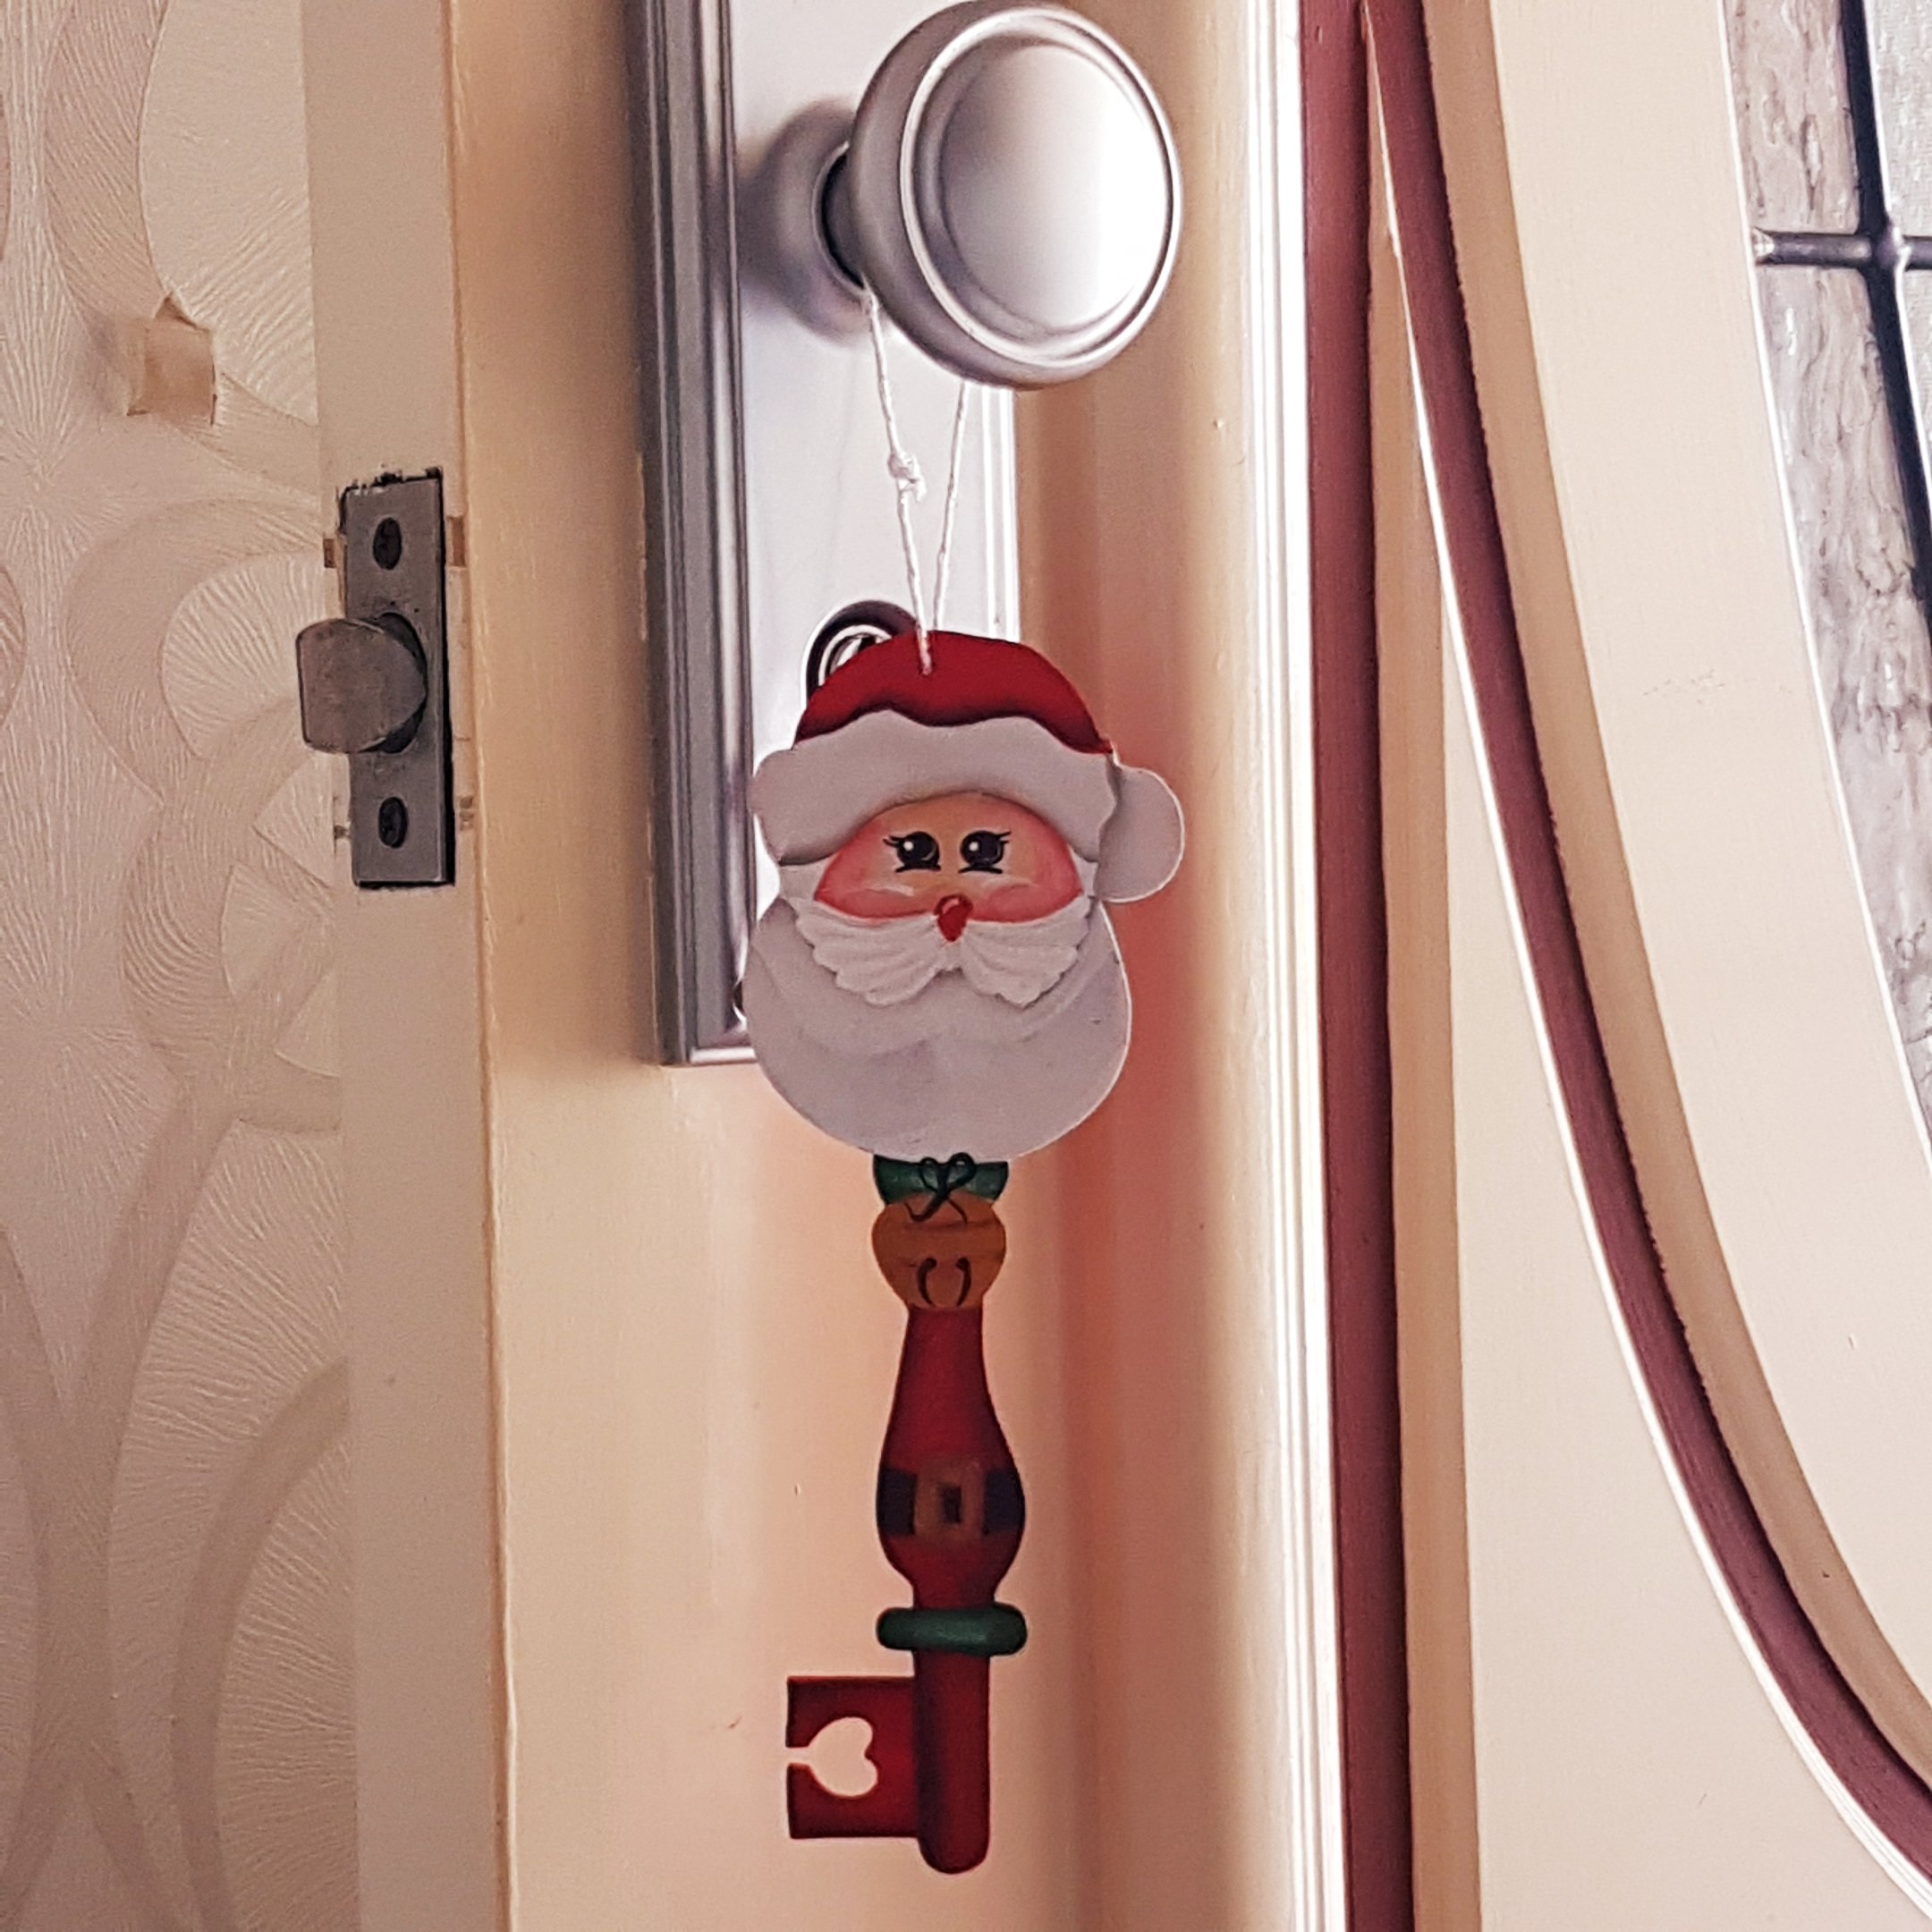 Santa key on door